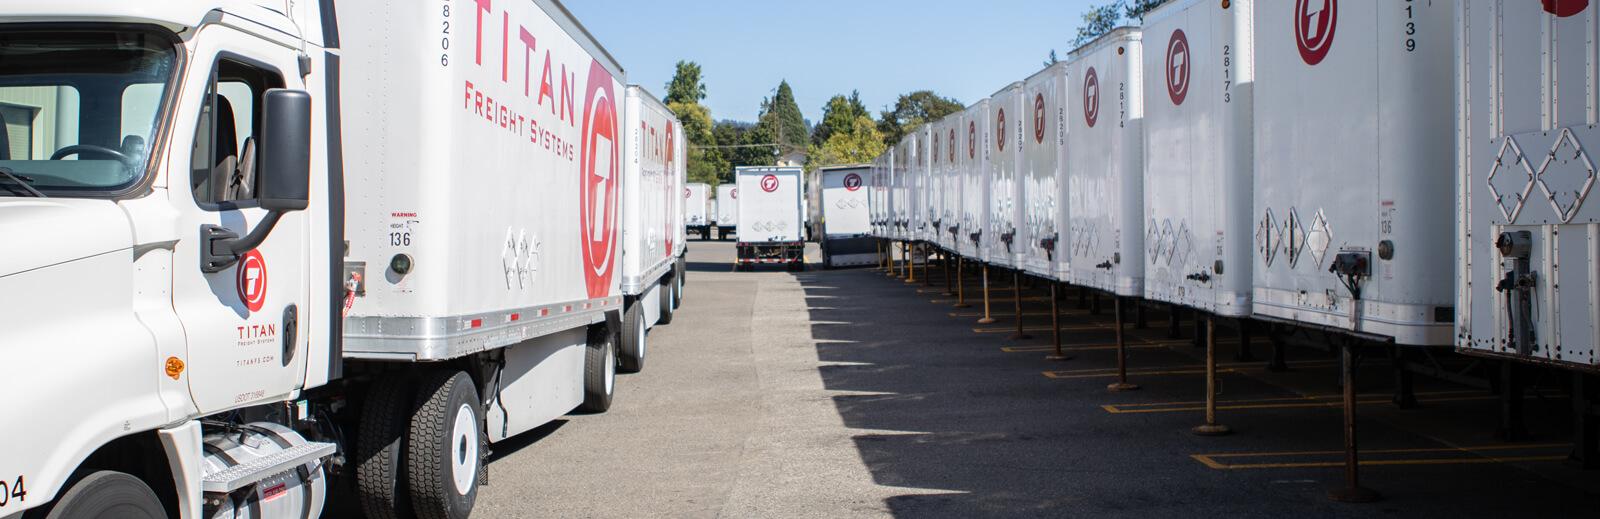 titan freight systems inc titan freight systems inc